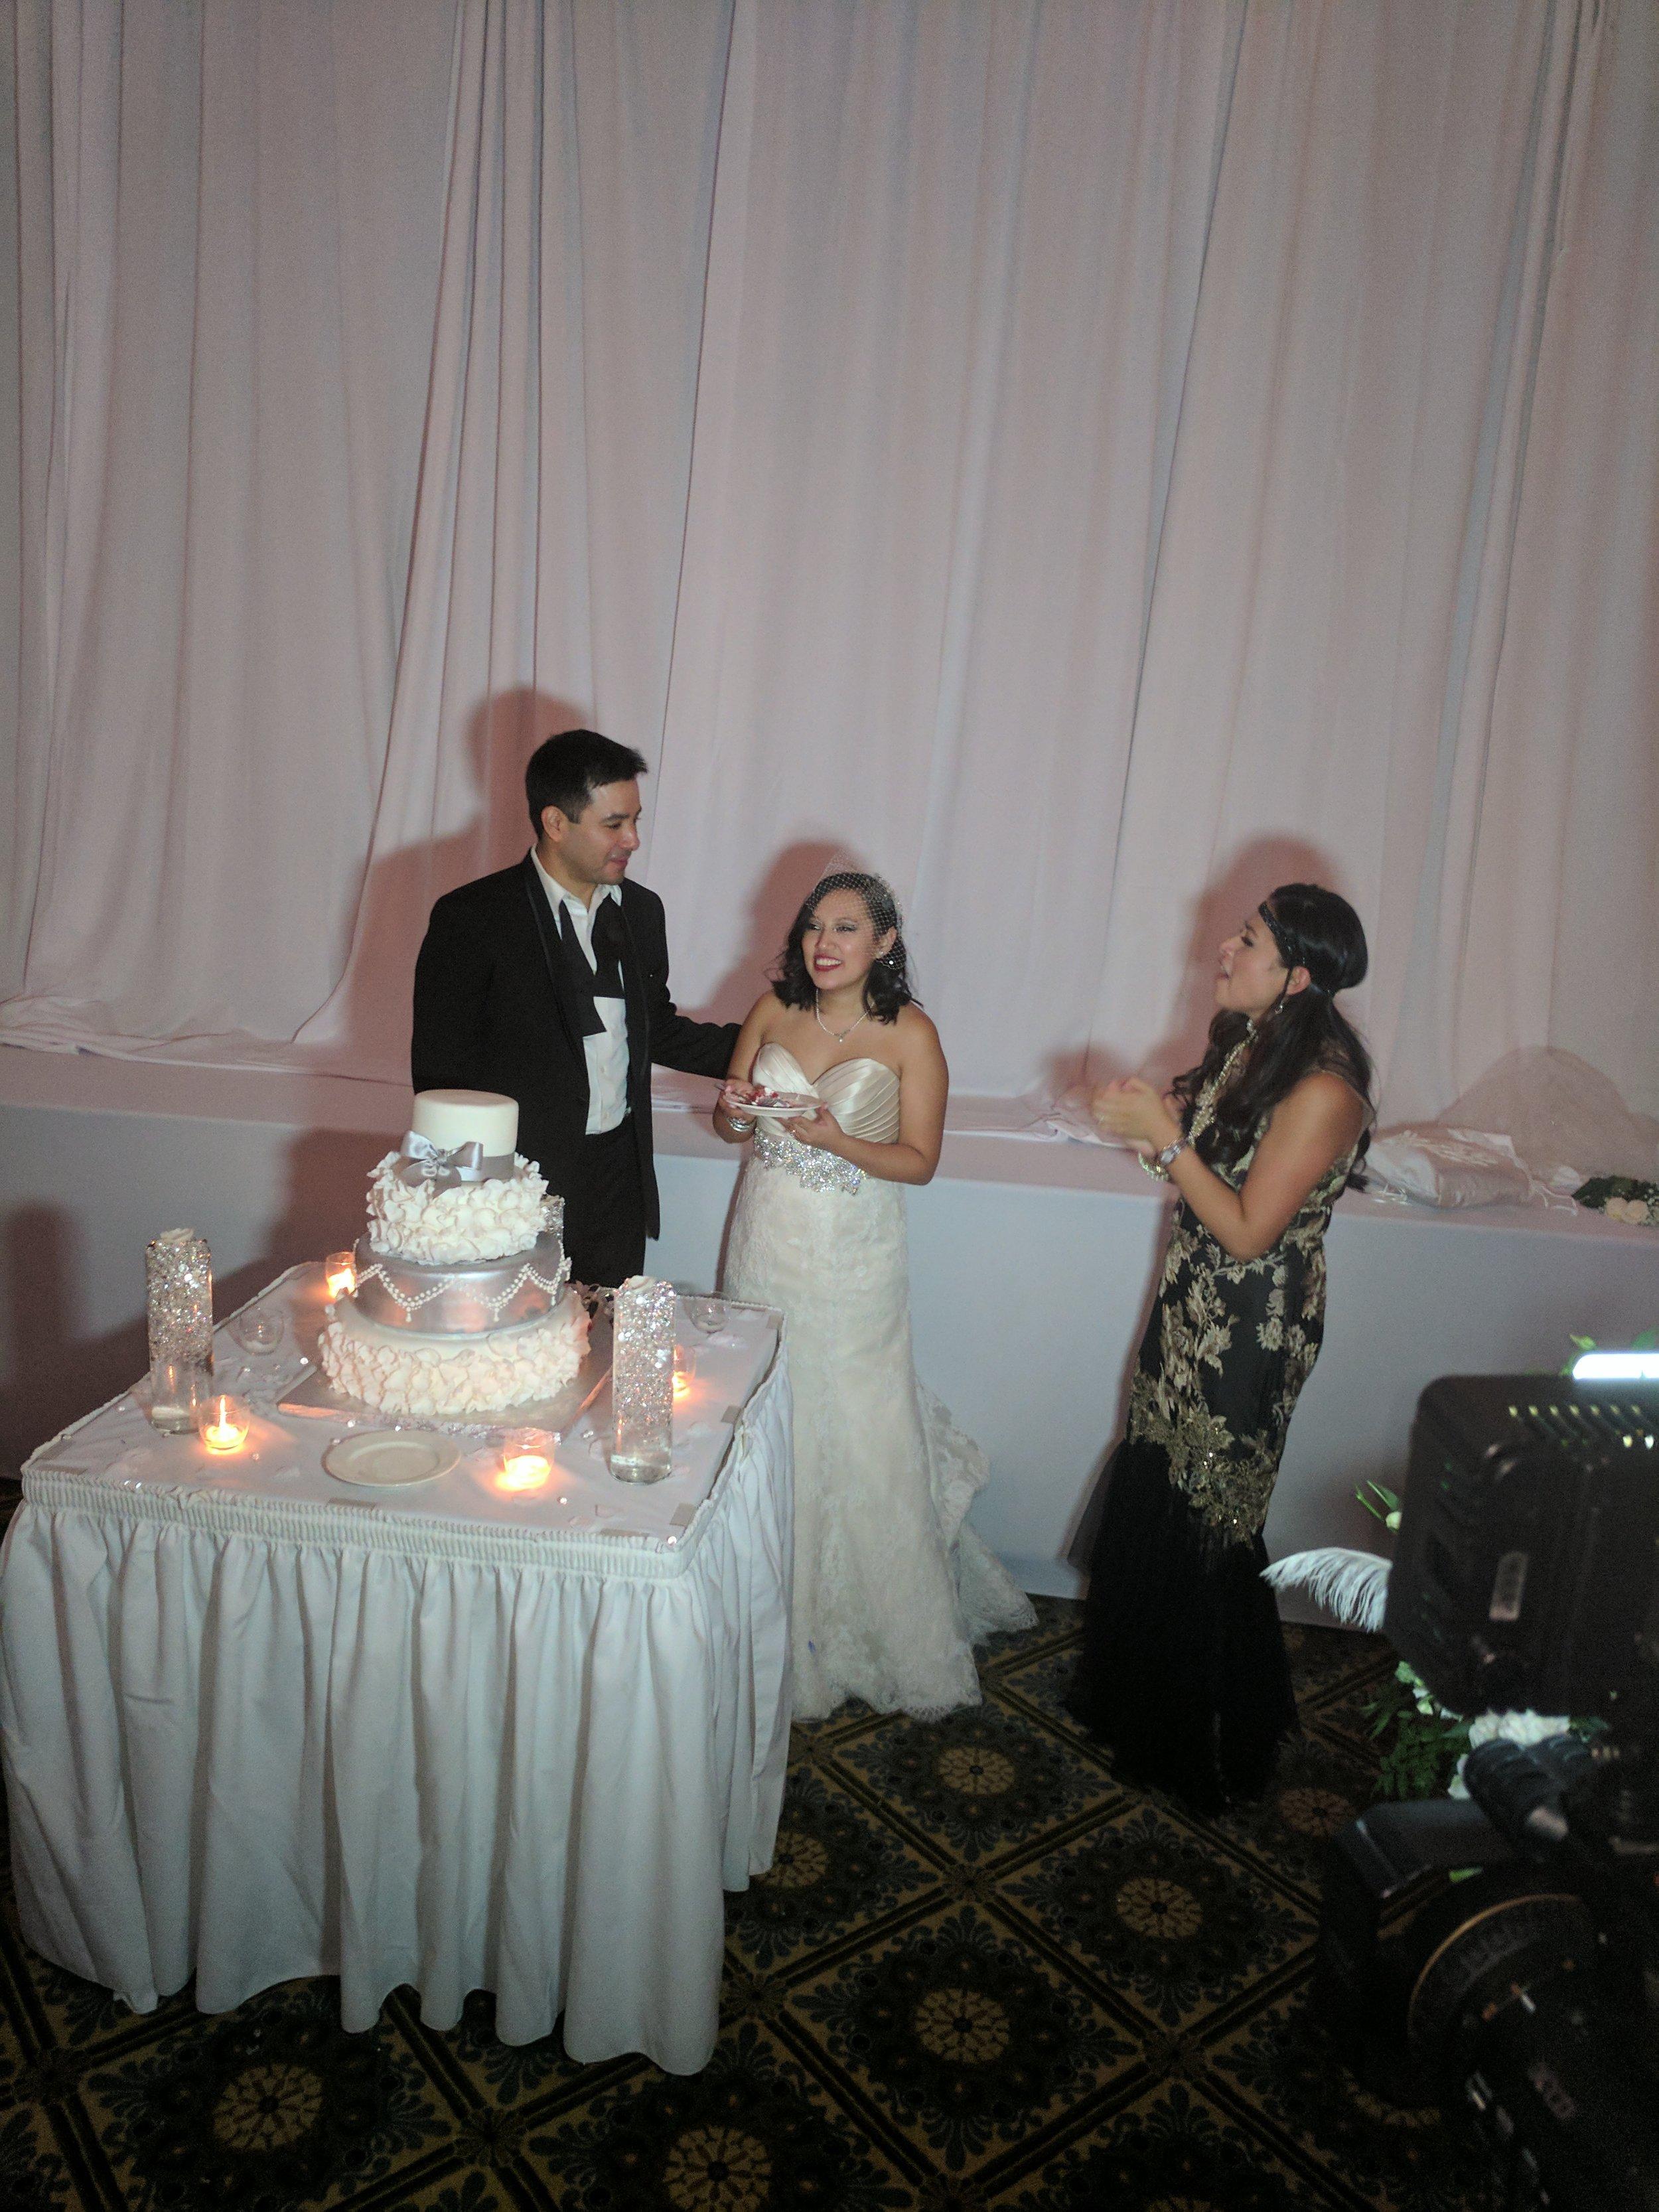 Cake, cake, cake, cake!